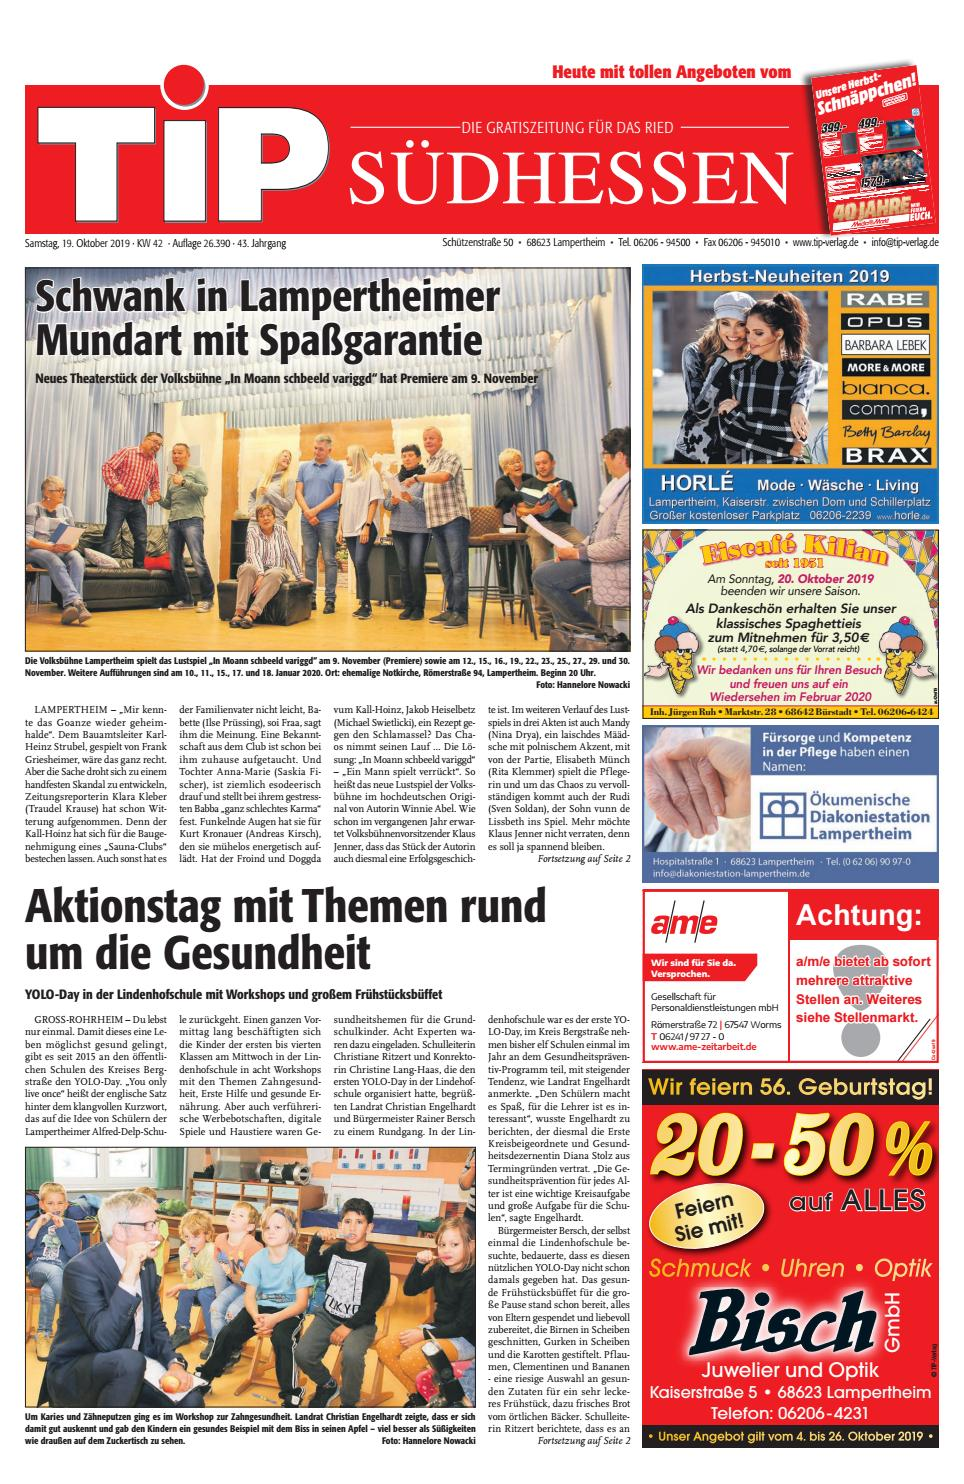 TIP42sa19 by Tip Verlag issuu